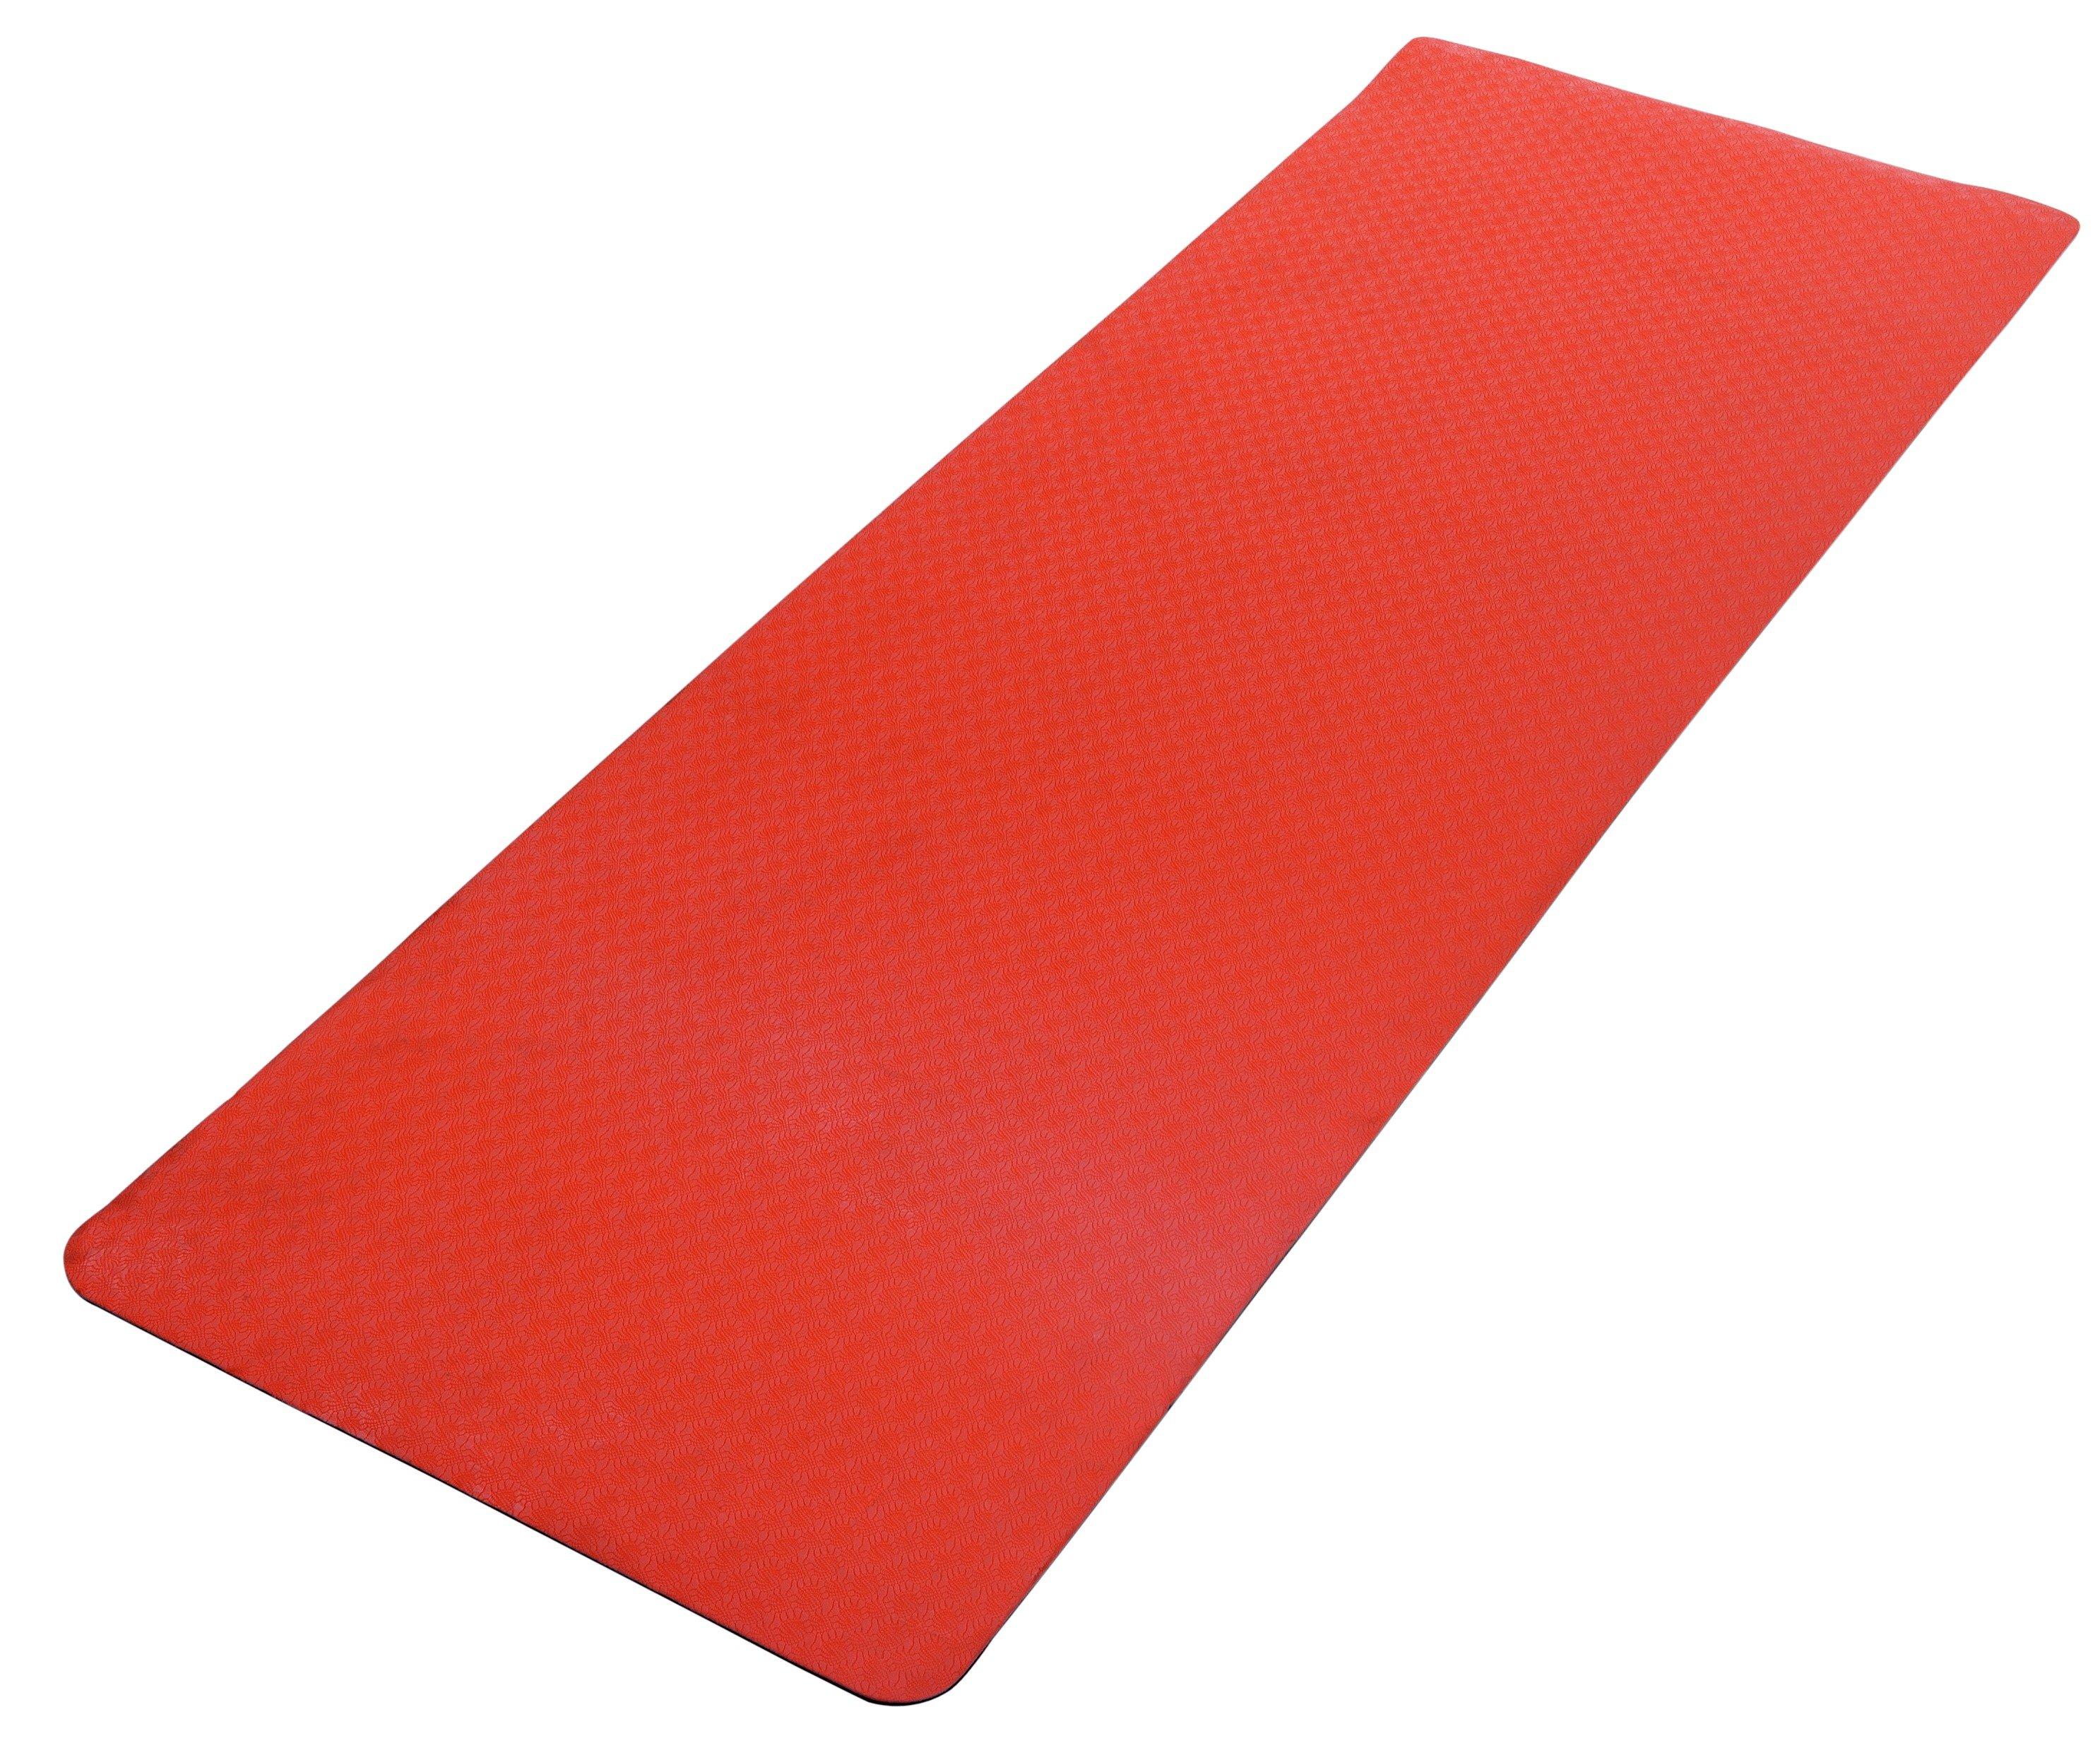 Women s Health Double Sided Yoga Mat (4557308)  c097b3f3a4